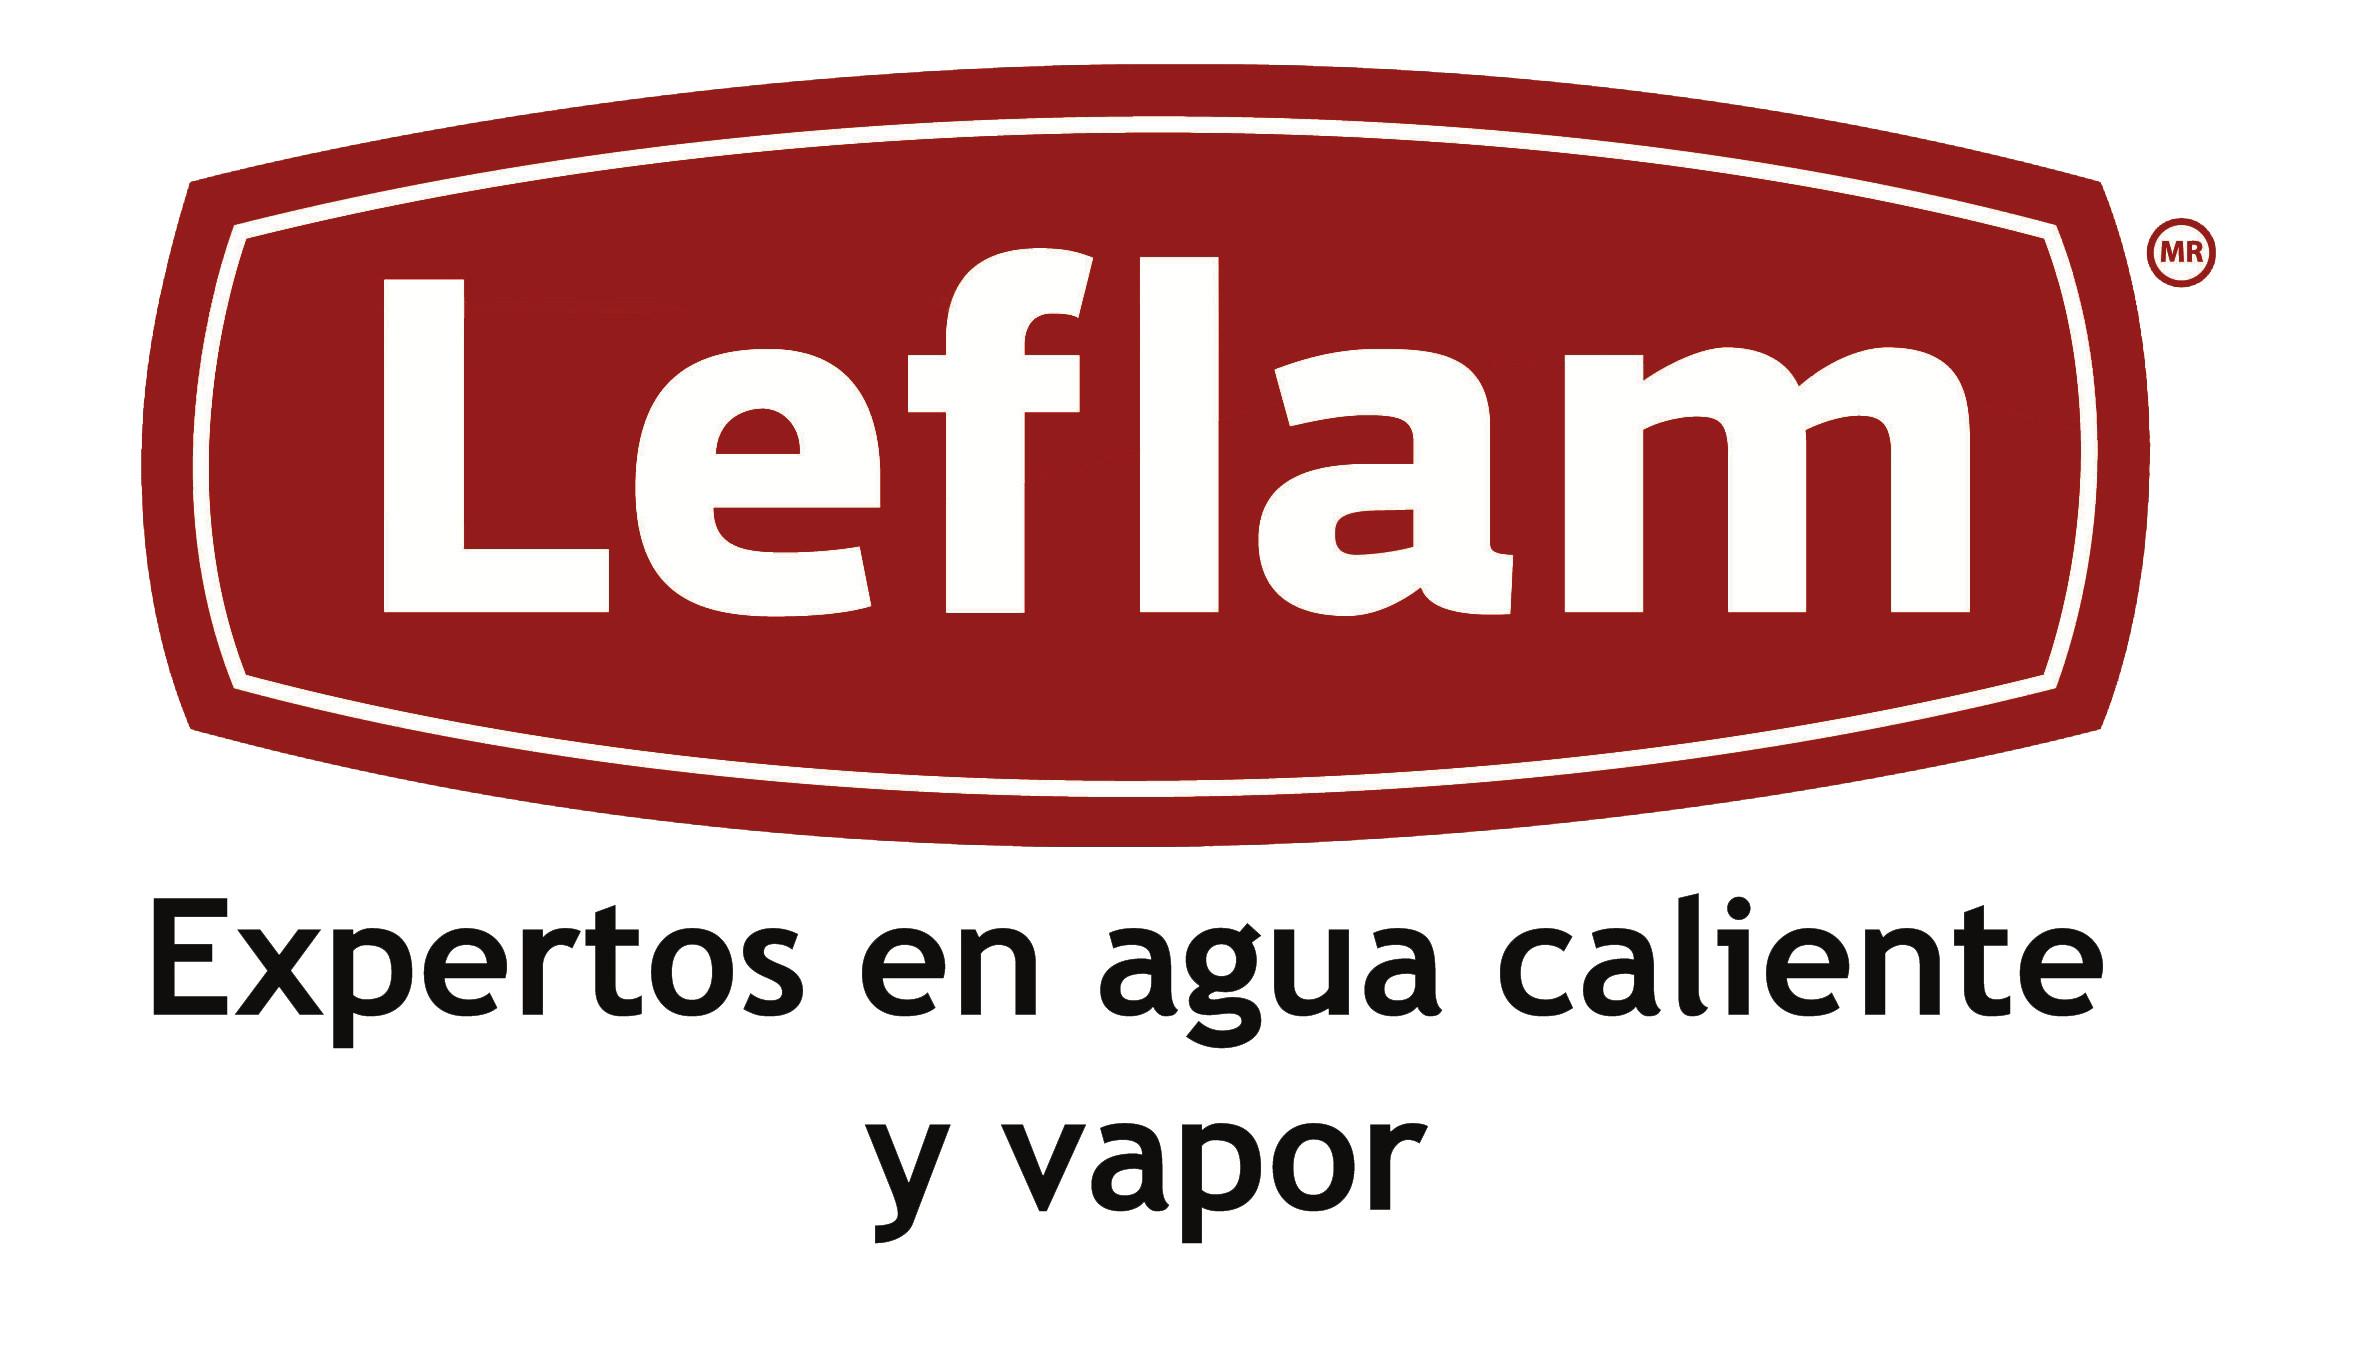 Leflam